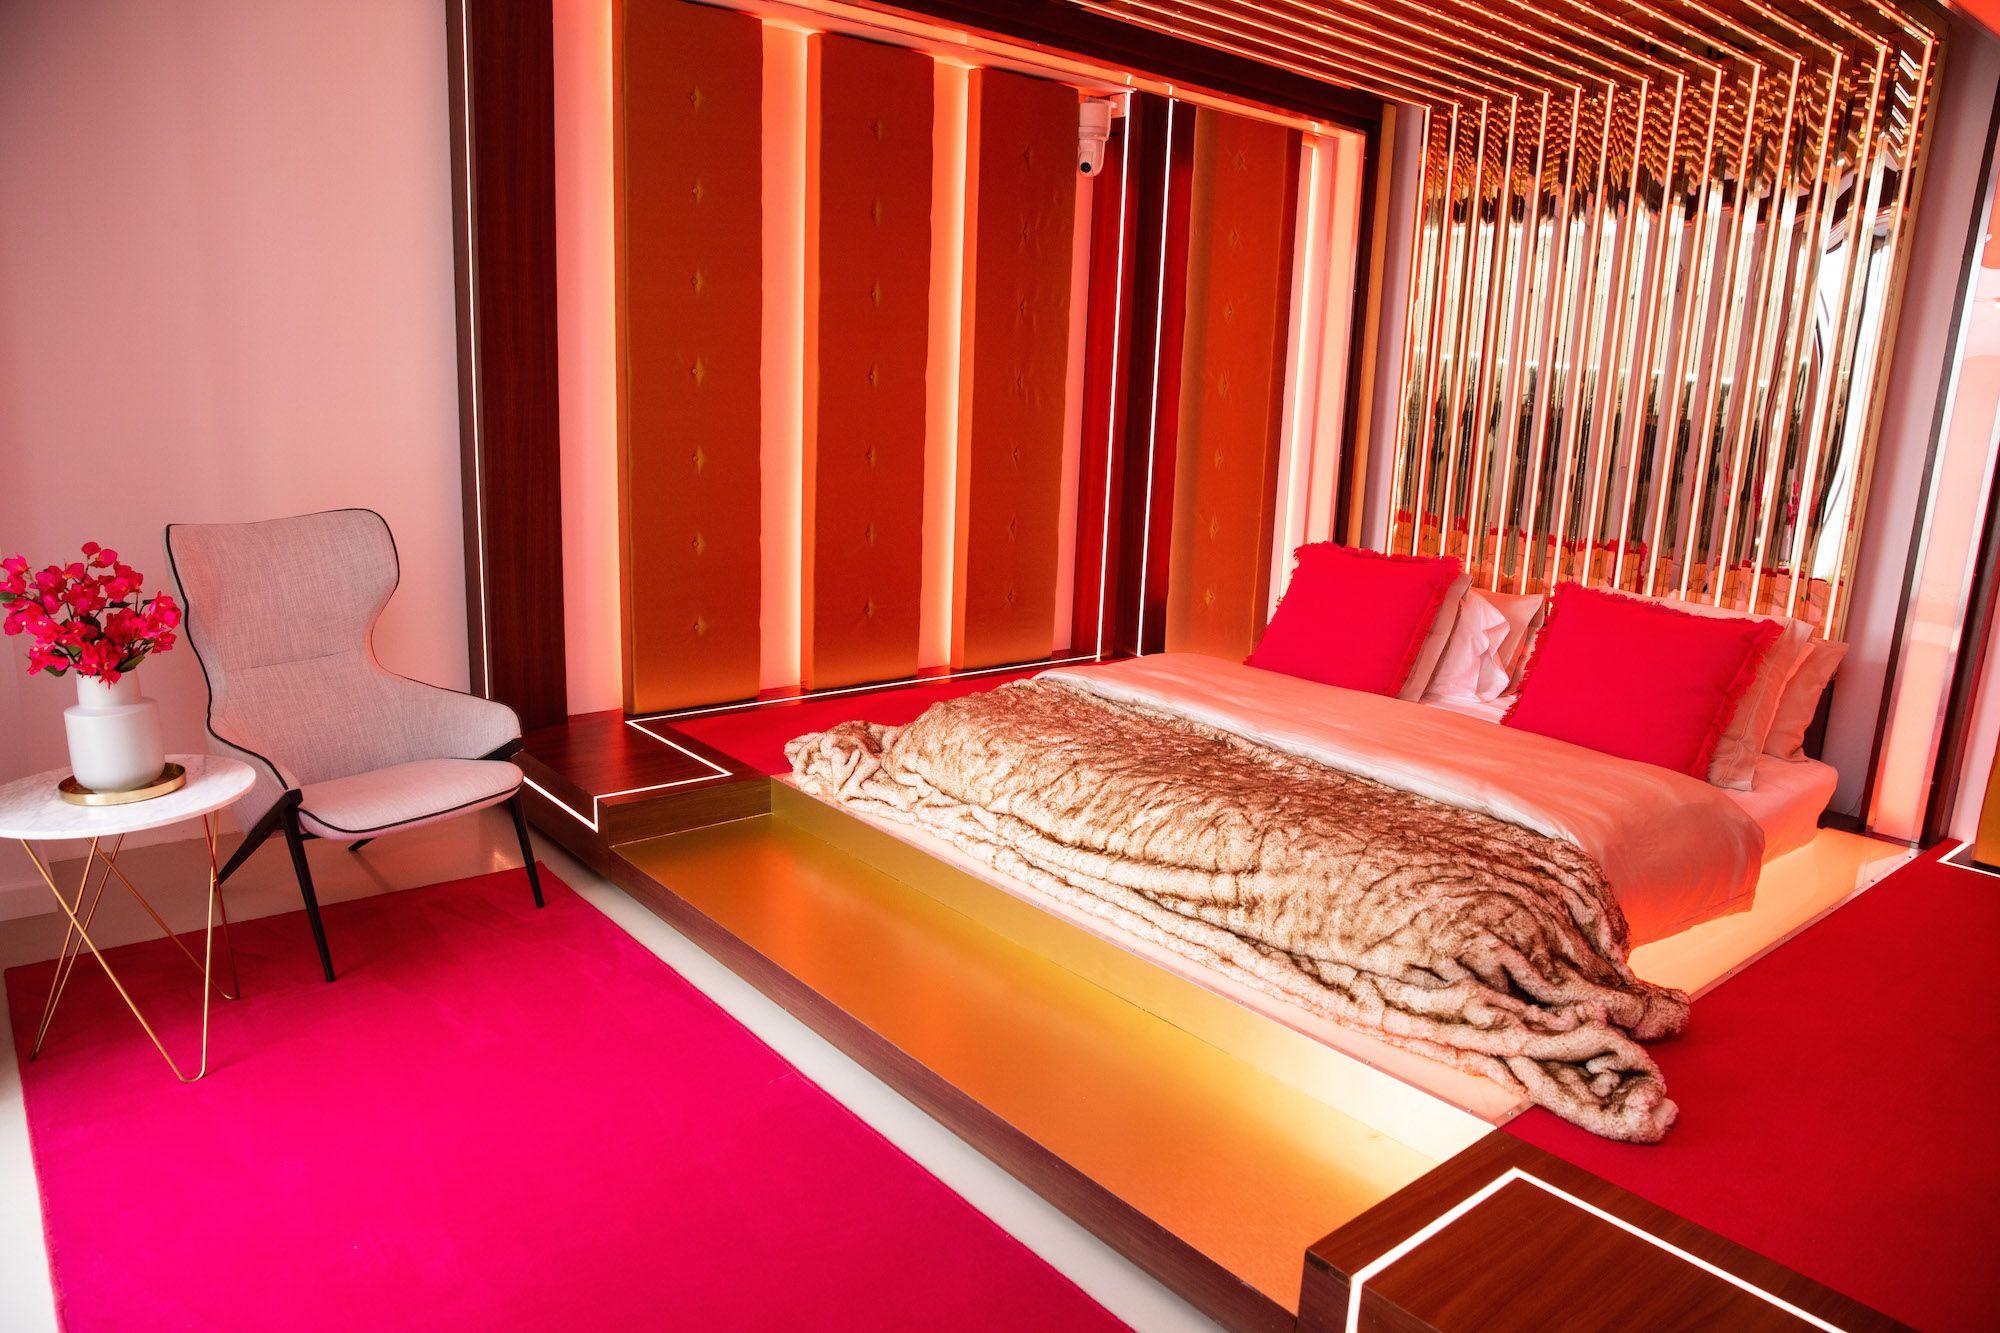 Image may contain: Love Island villa, 2019, villa, Love Island, location, Majorca, Hotel, Rug, Wood, Bed, Bedroom, Lighting, Room, Housing, Building, Chair, Interior Design, Indoors, Furniture